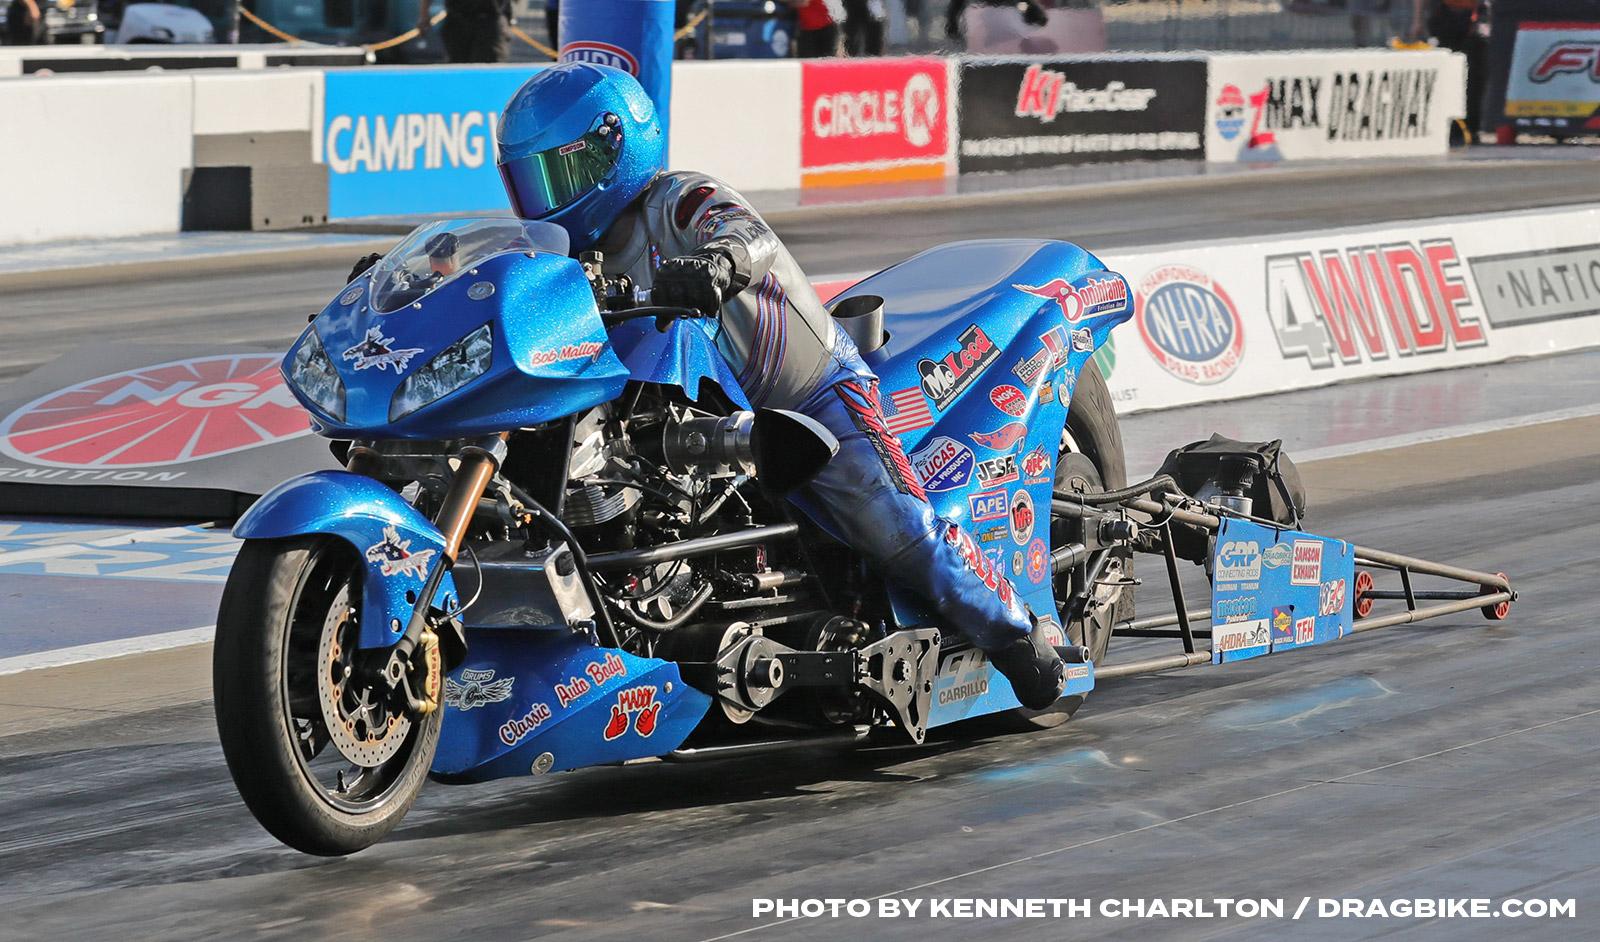 NHRA Top Fuel Harley - Bob Malloy